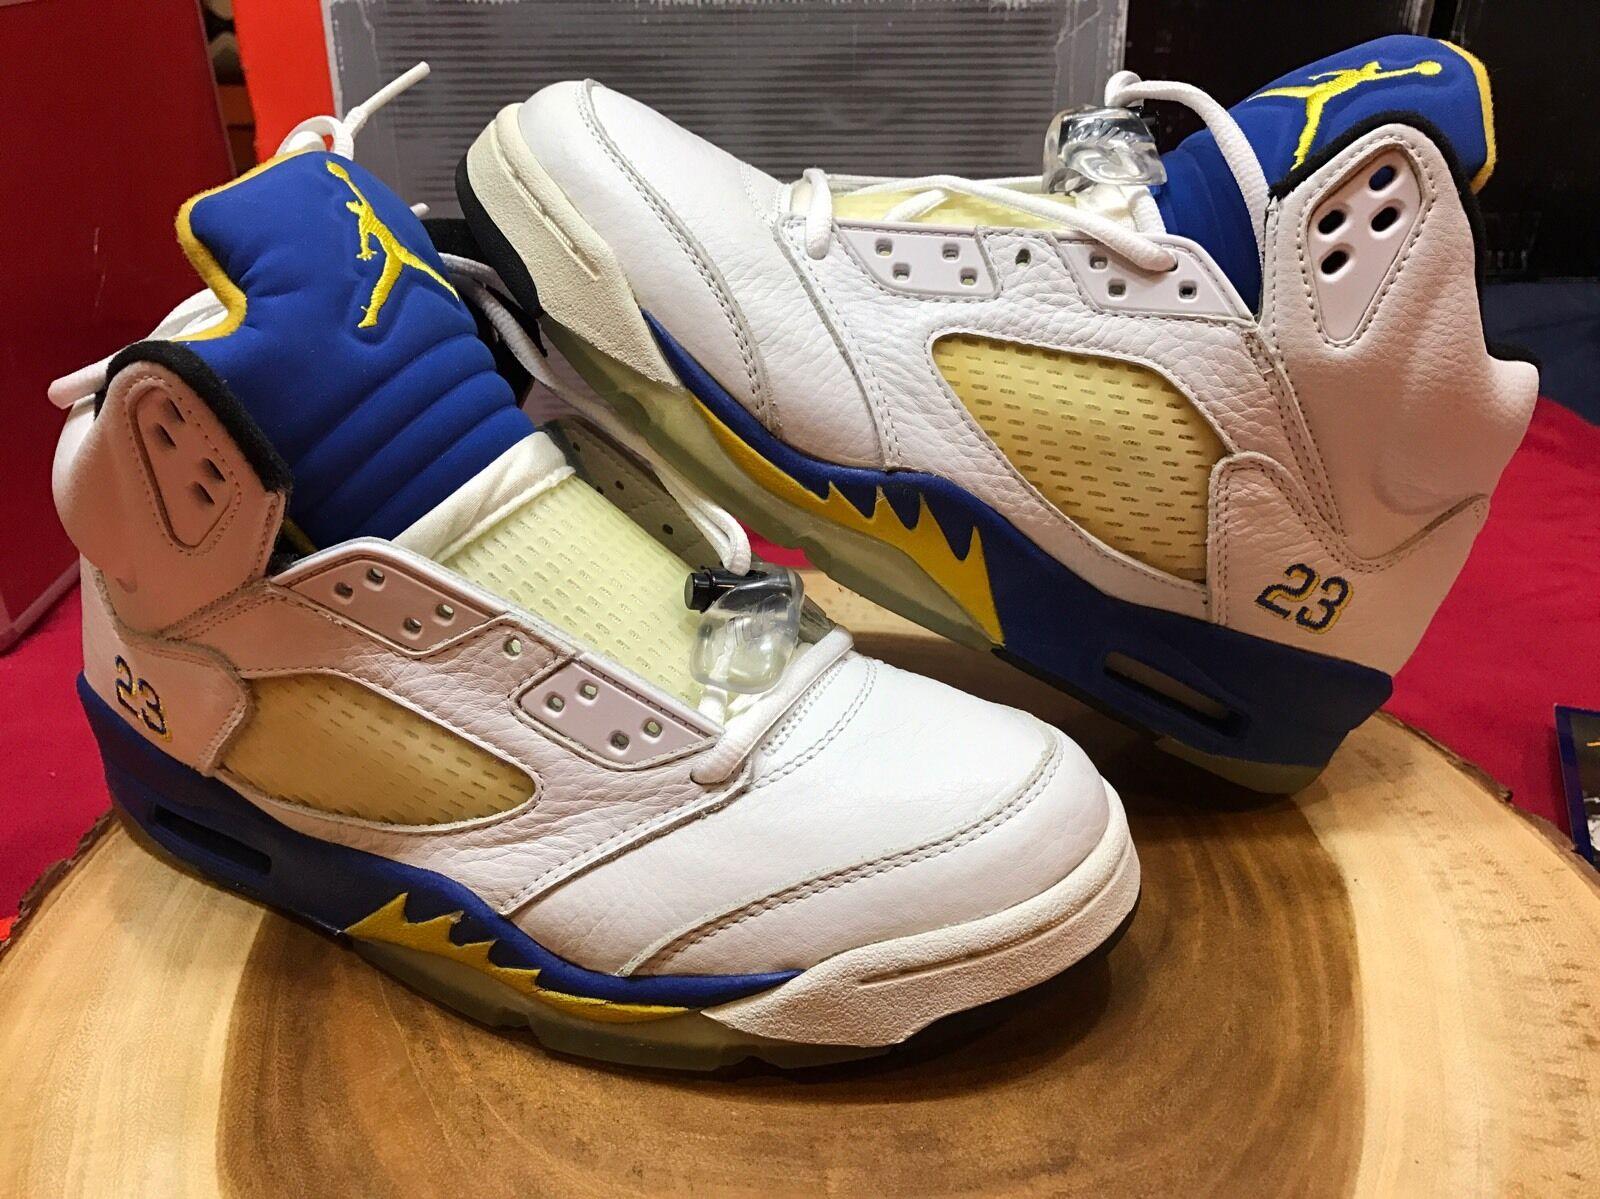 Nike air jordan 9 retr v laney taglia 9 jordan og bel air oreo toro cdp - iv, v, vi, vii, x, xi 67a678